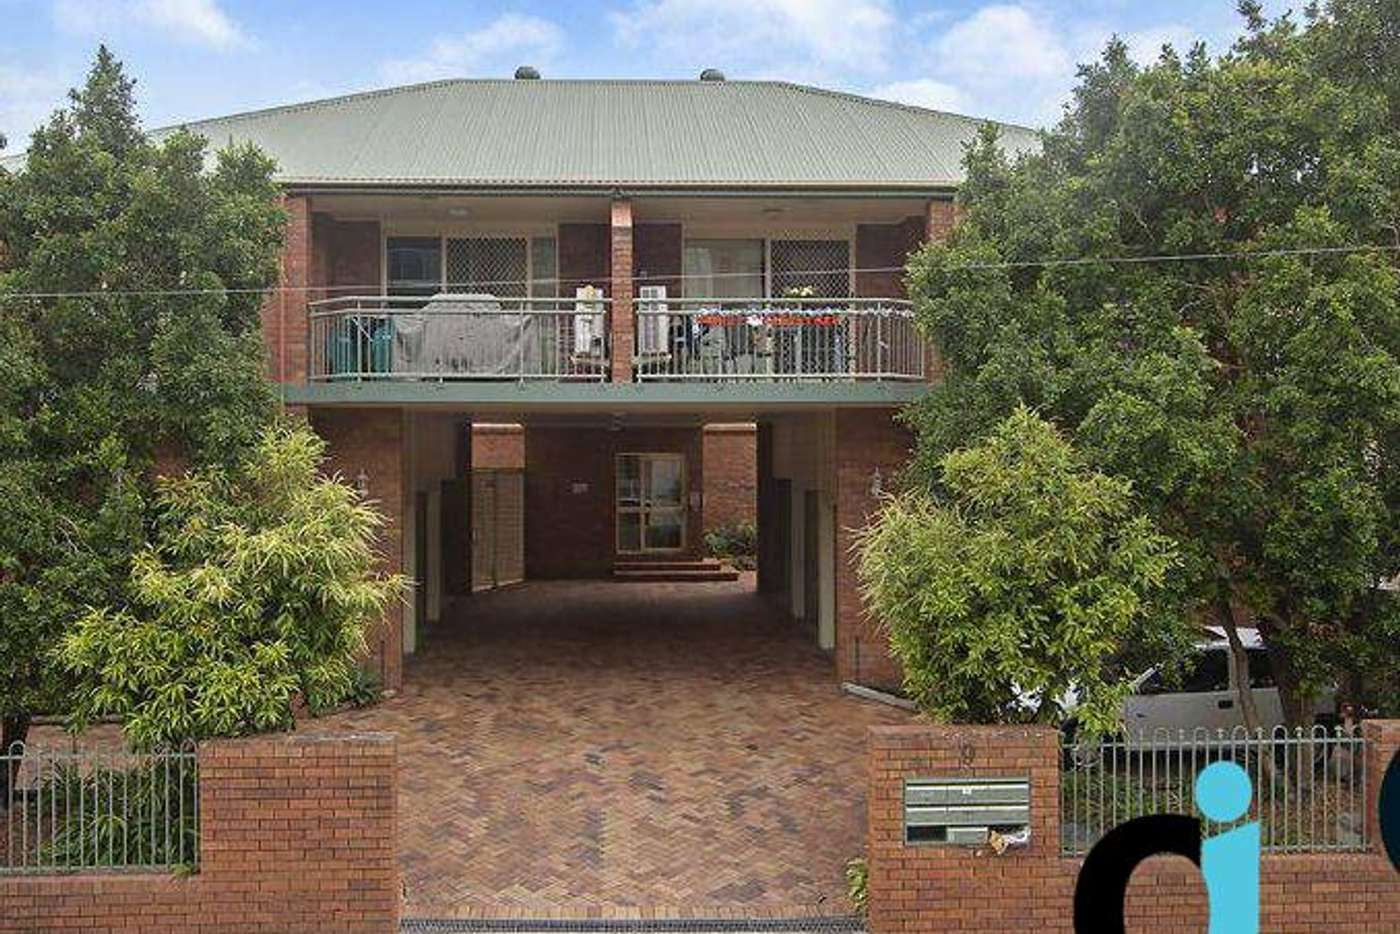 Main view of Homely house listing, 1/9 Westacott Street, Nundah QLD 4012